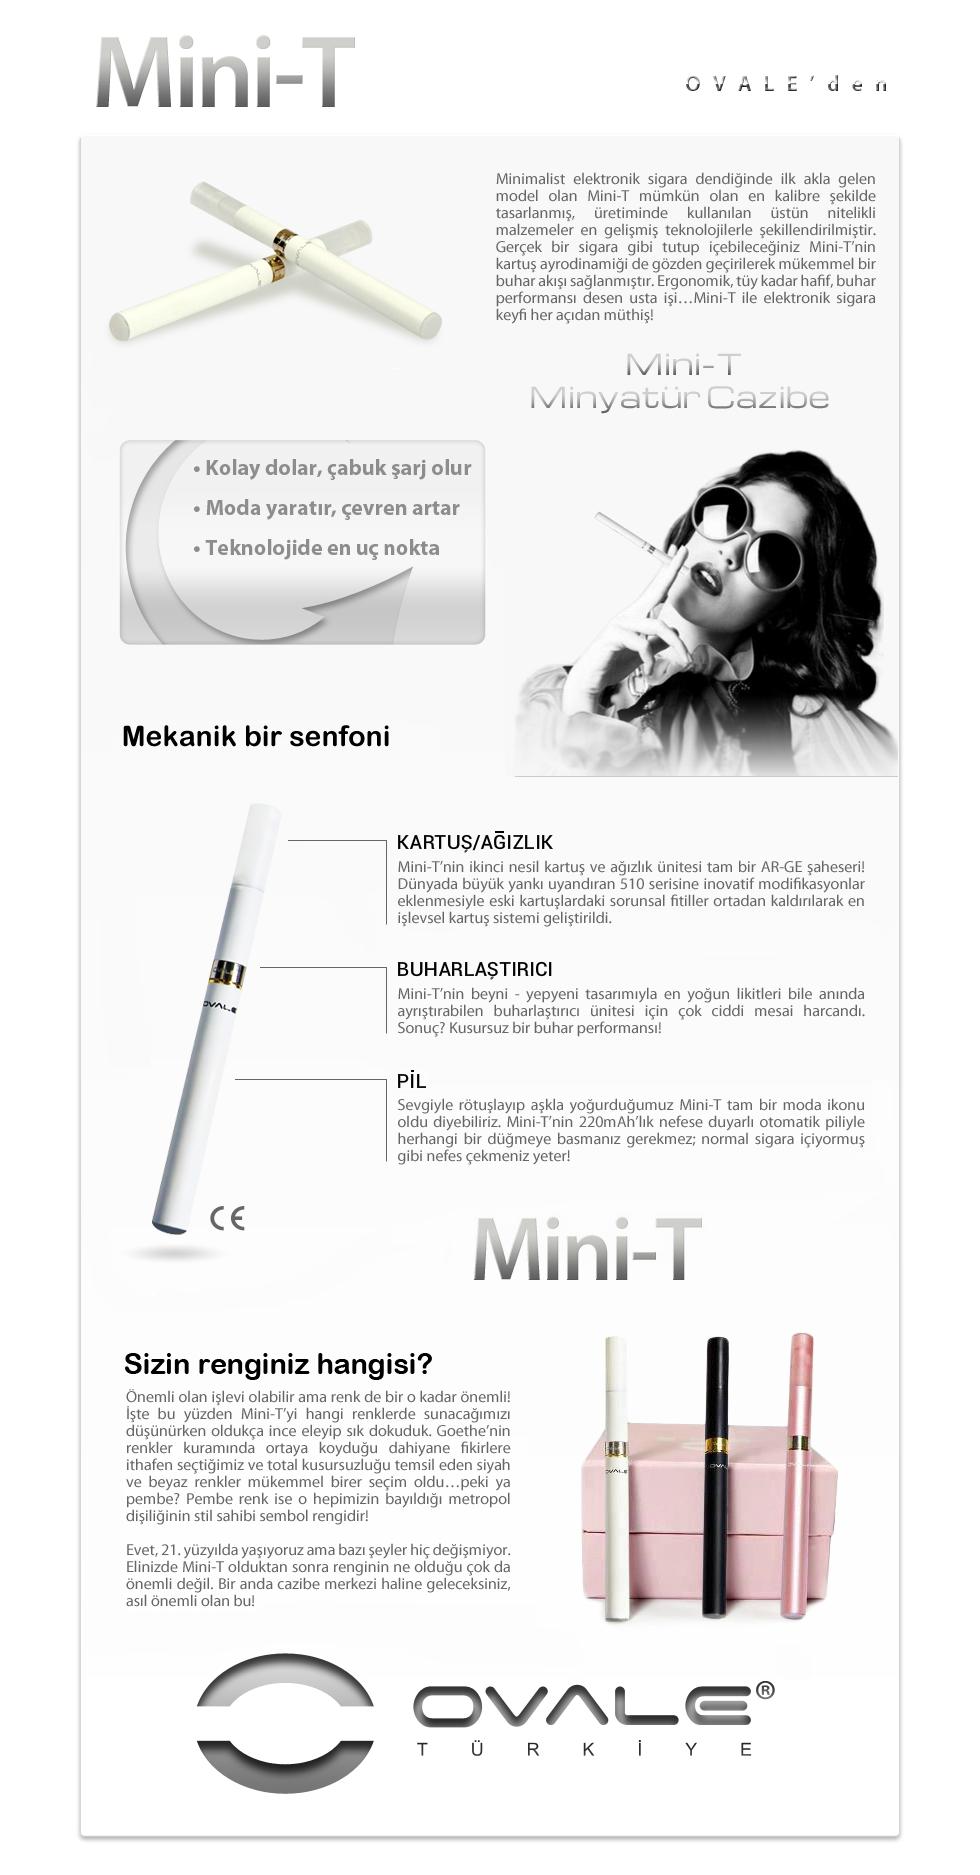 elektronik sigara, esigara, e, sigara, sigarayı bırak, elektronik sigara likit, ovale, joyetech, mini